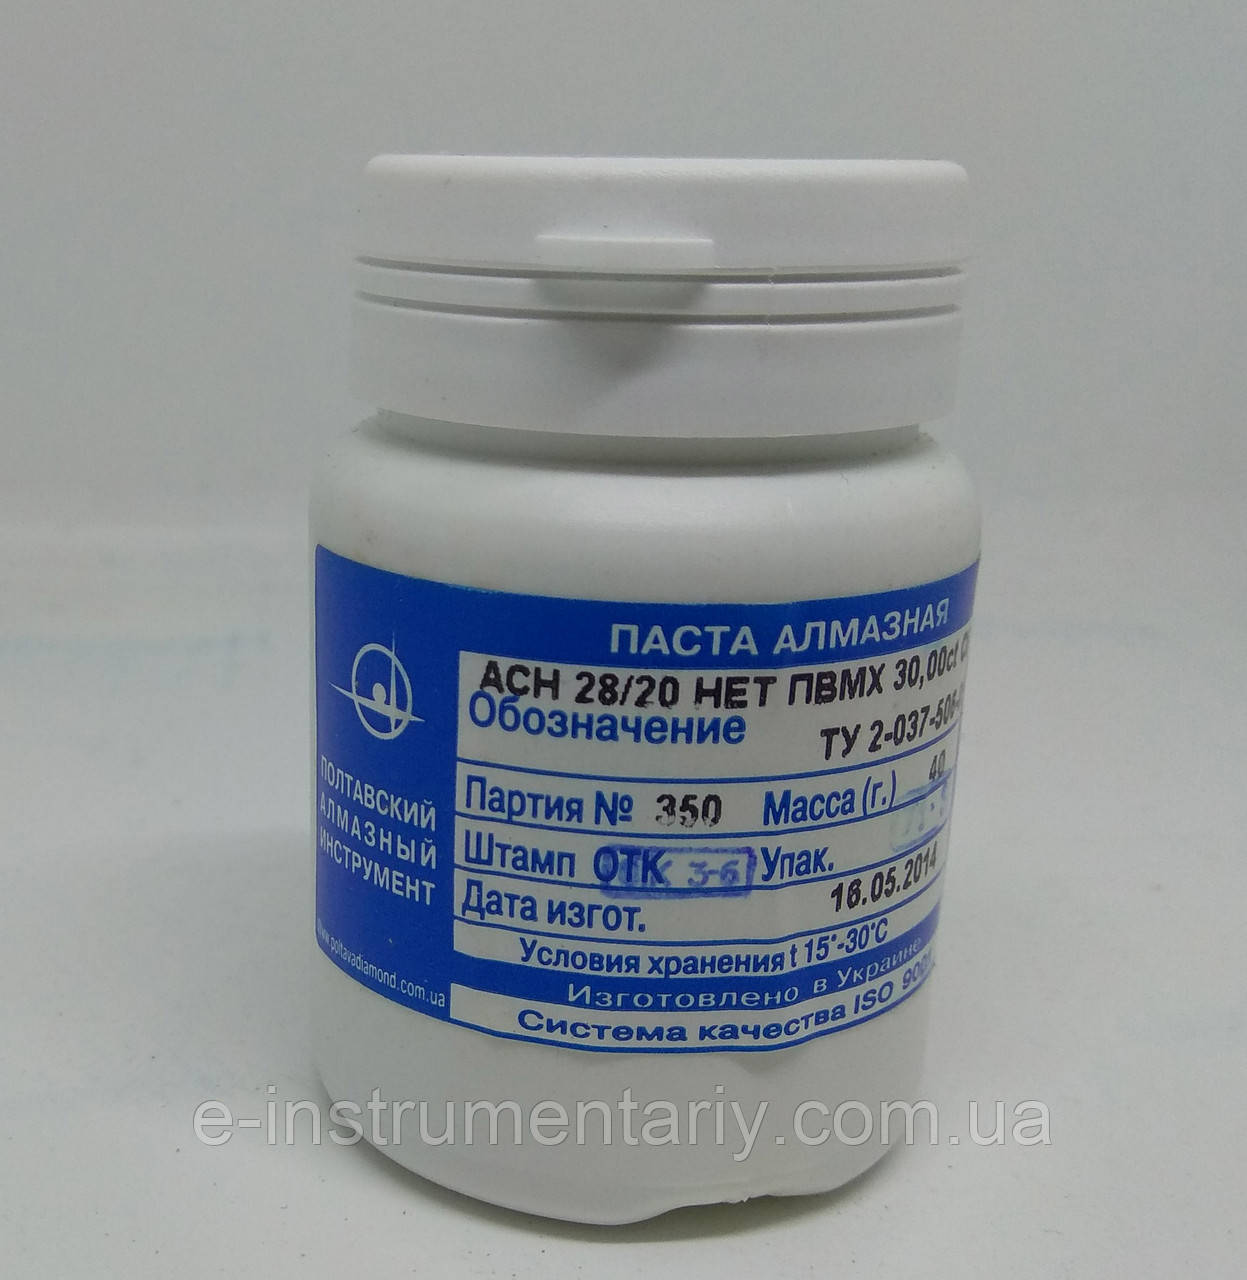 Паста алмазна для обробки каменю універсальна АСН 28/20 ПВМХ. 40гр